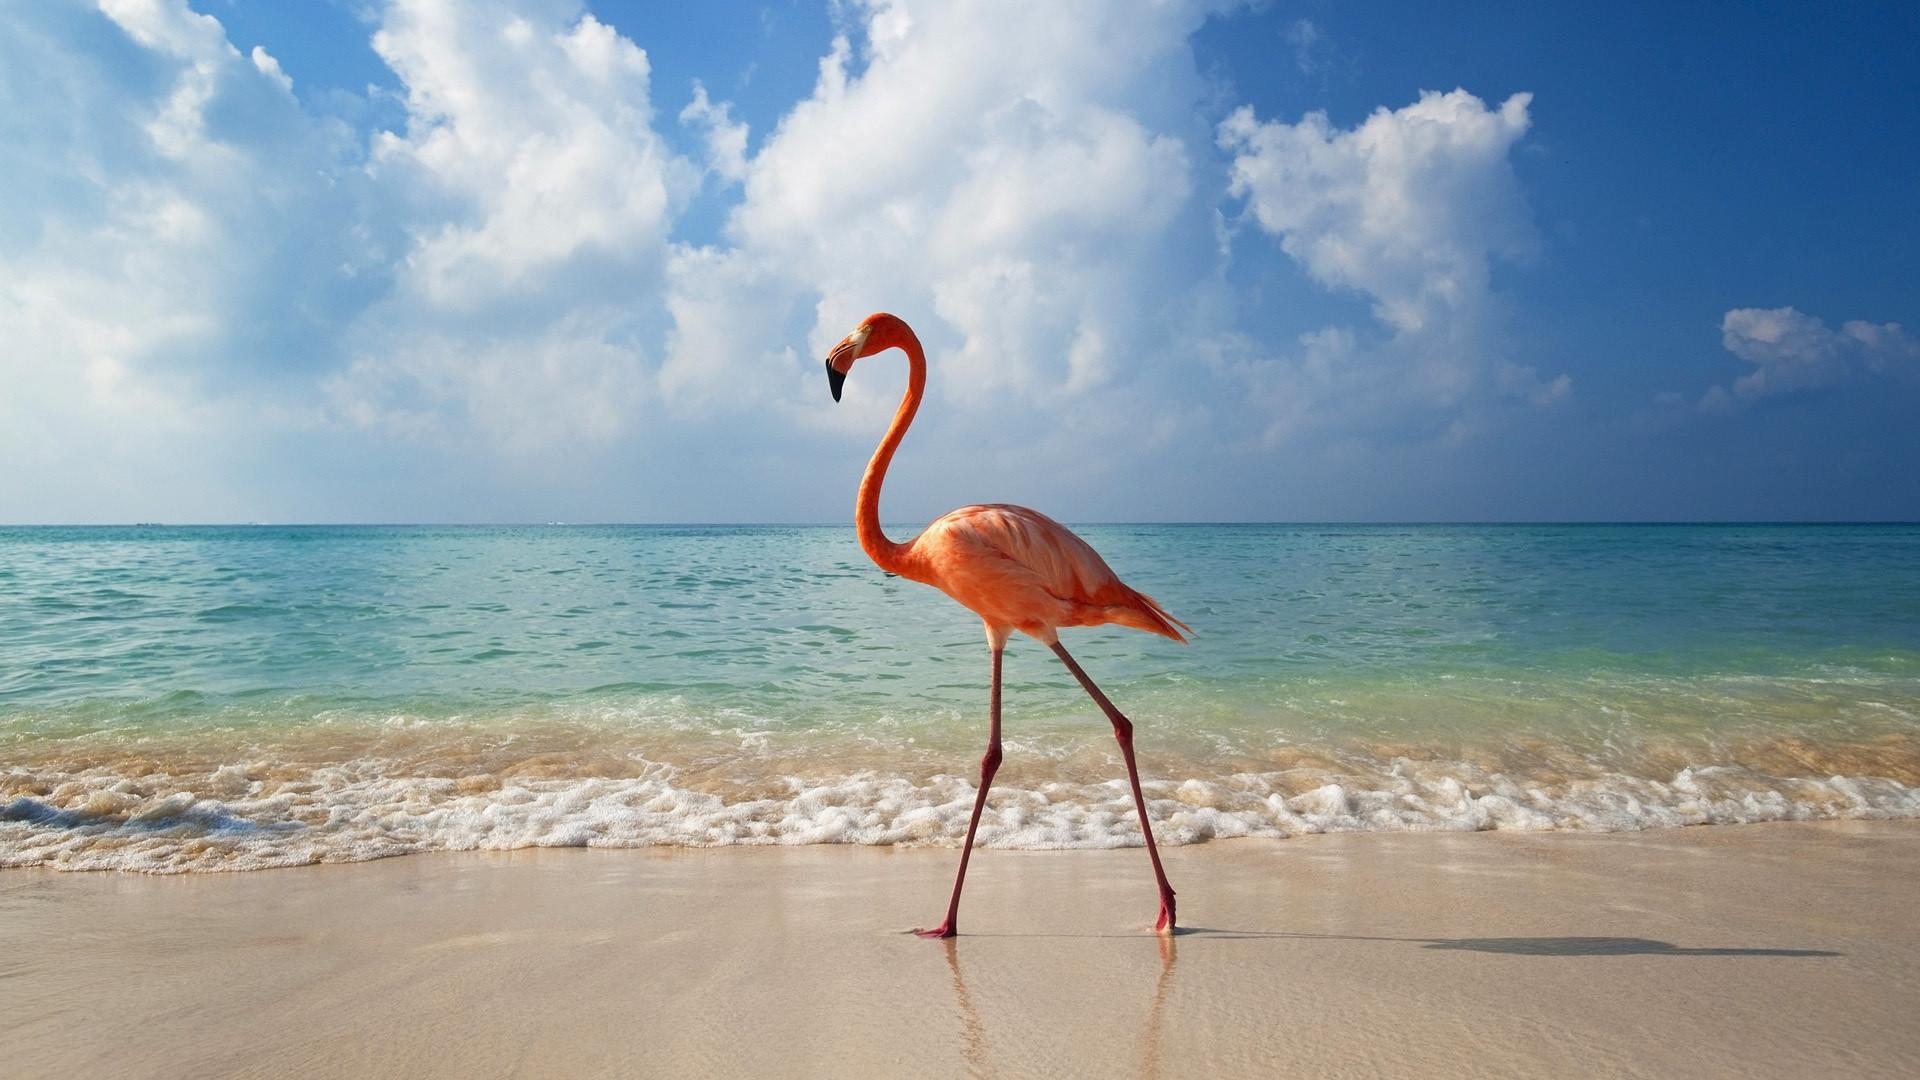 Flamingo Game